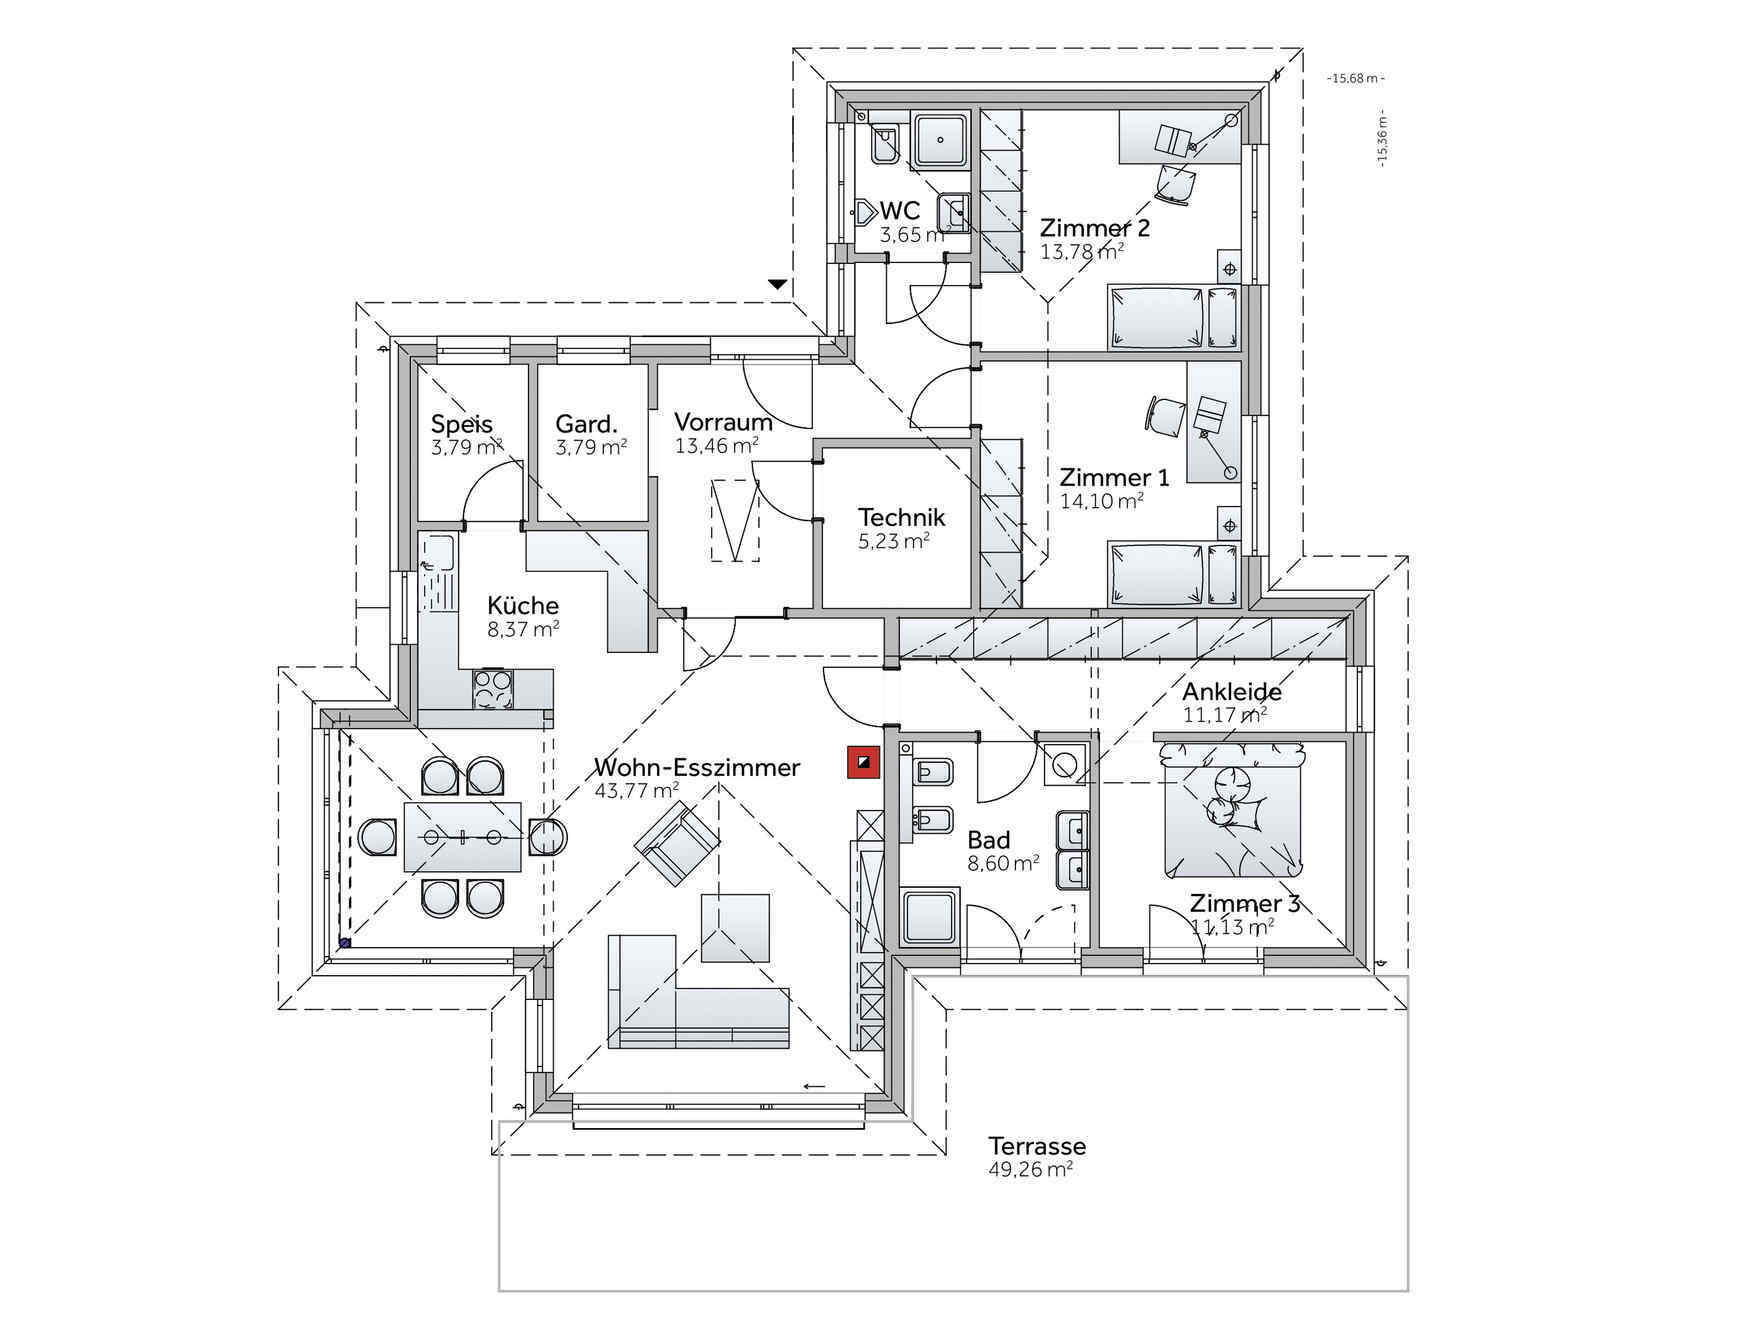 Bungalow Mit Individuellem Bungalow Grundriss Gestalten Vario Haus